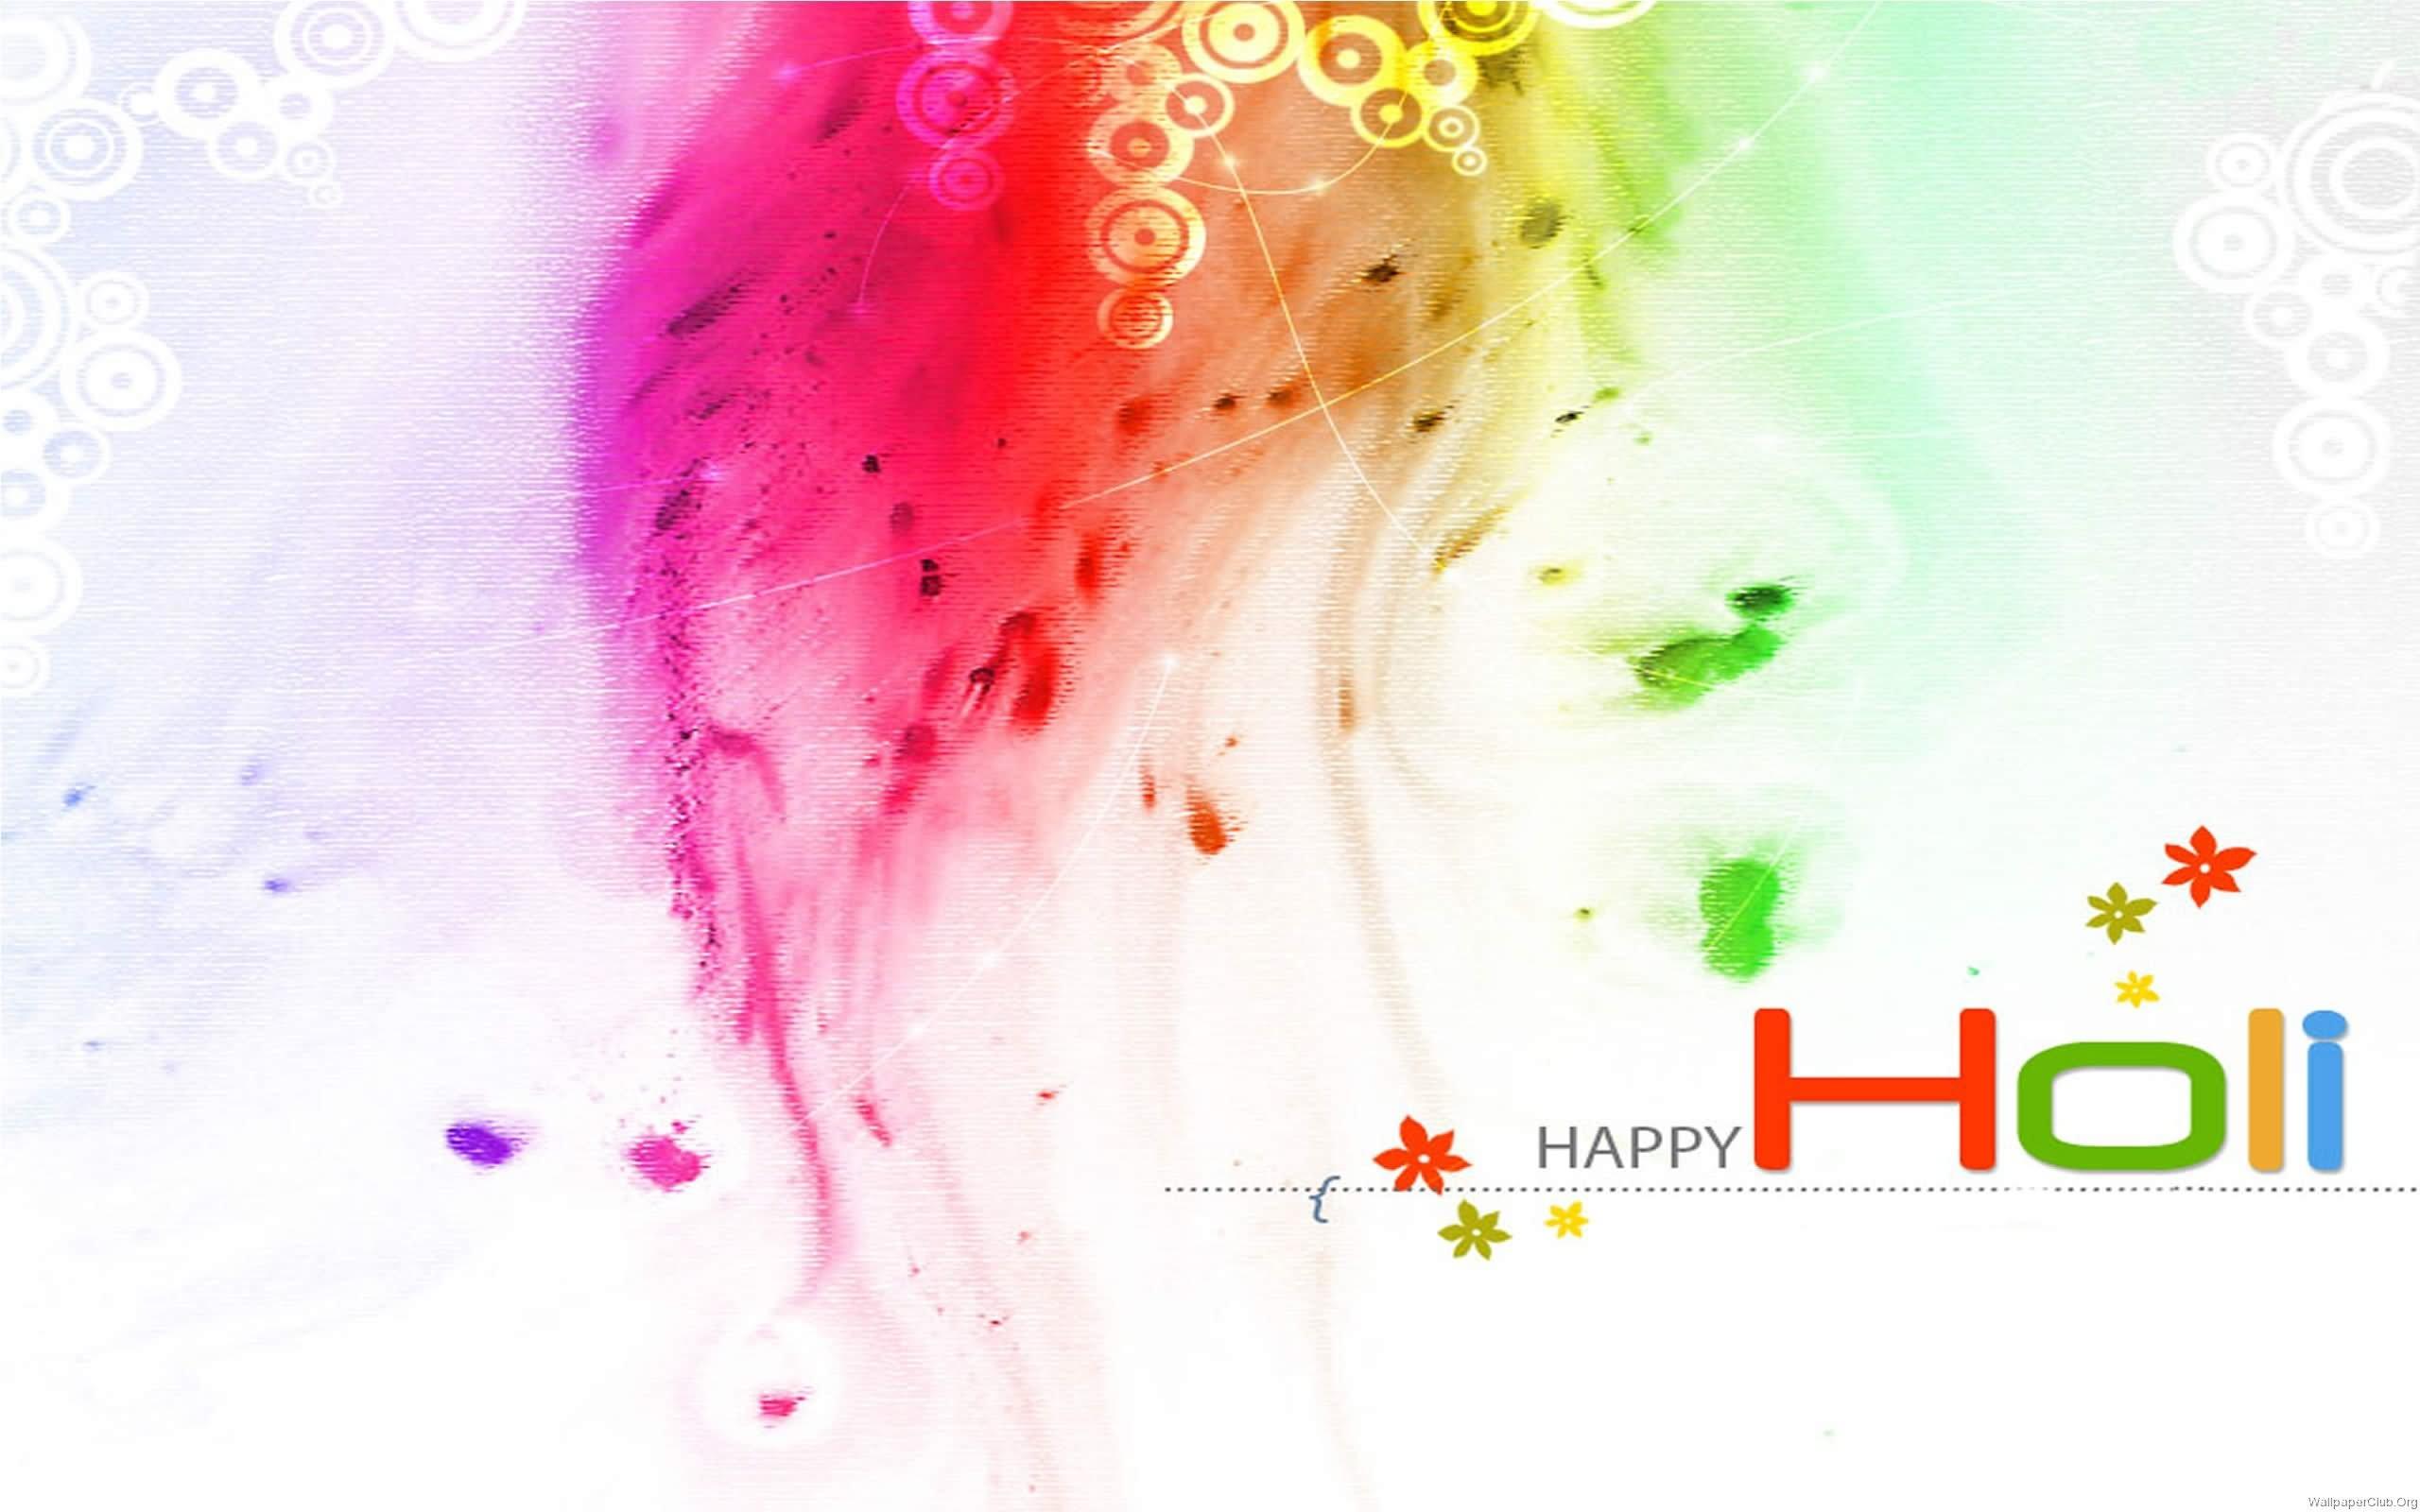 Happy Holi HD Wallpaper